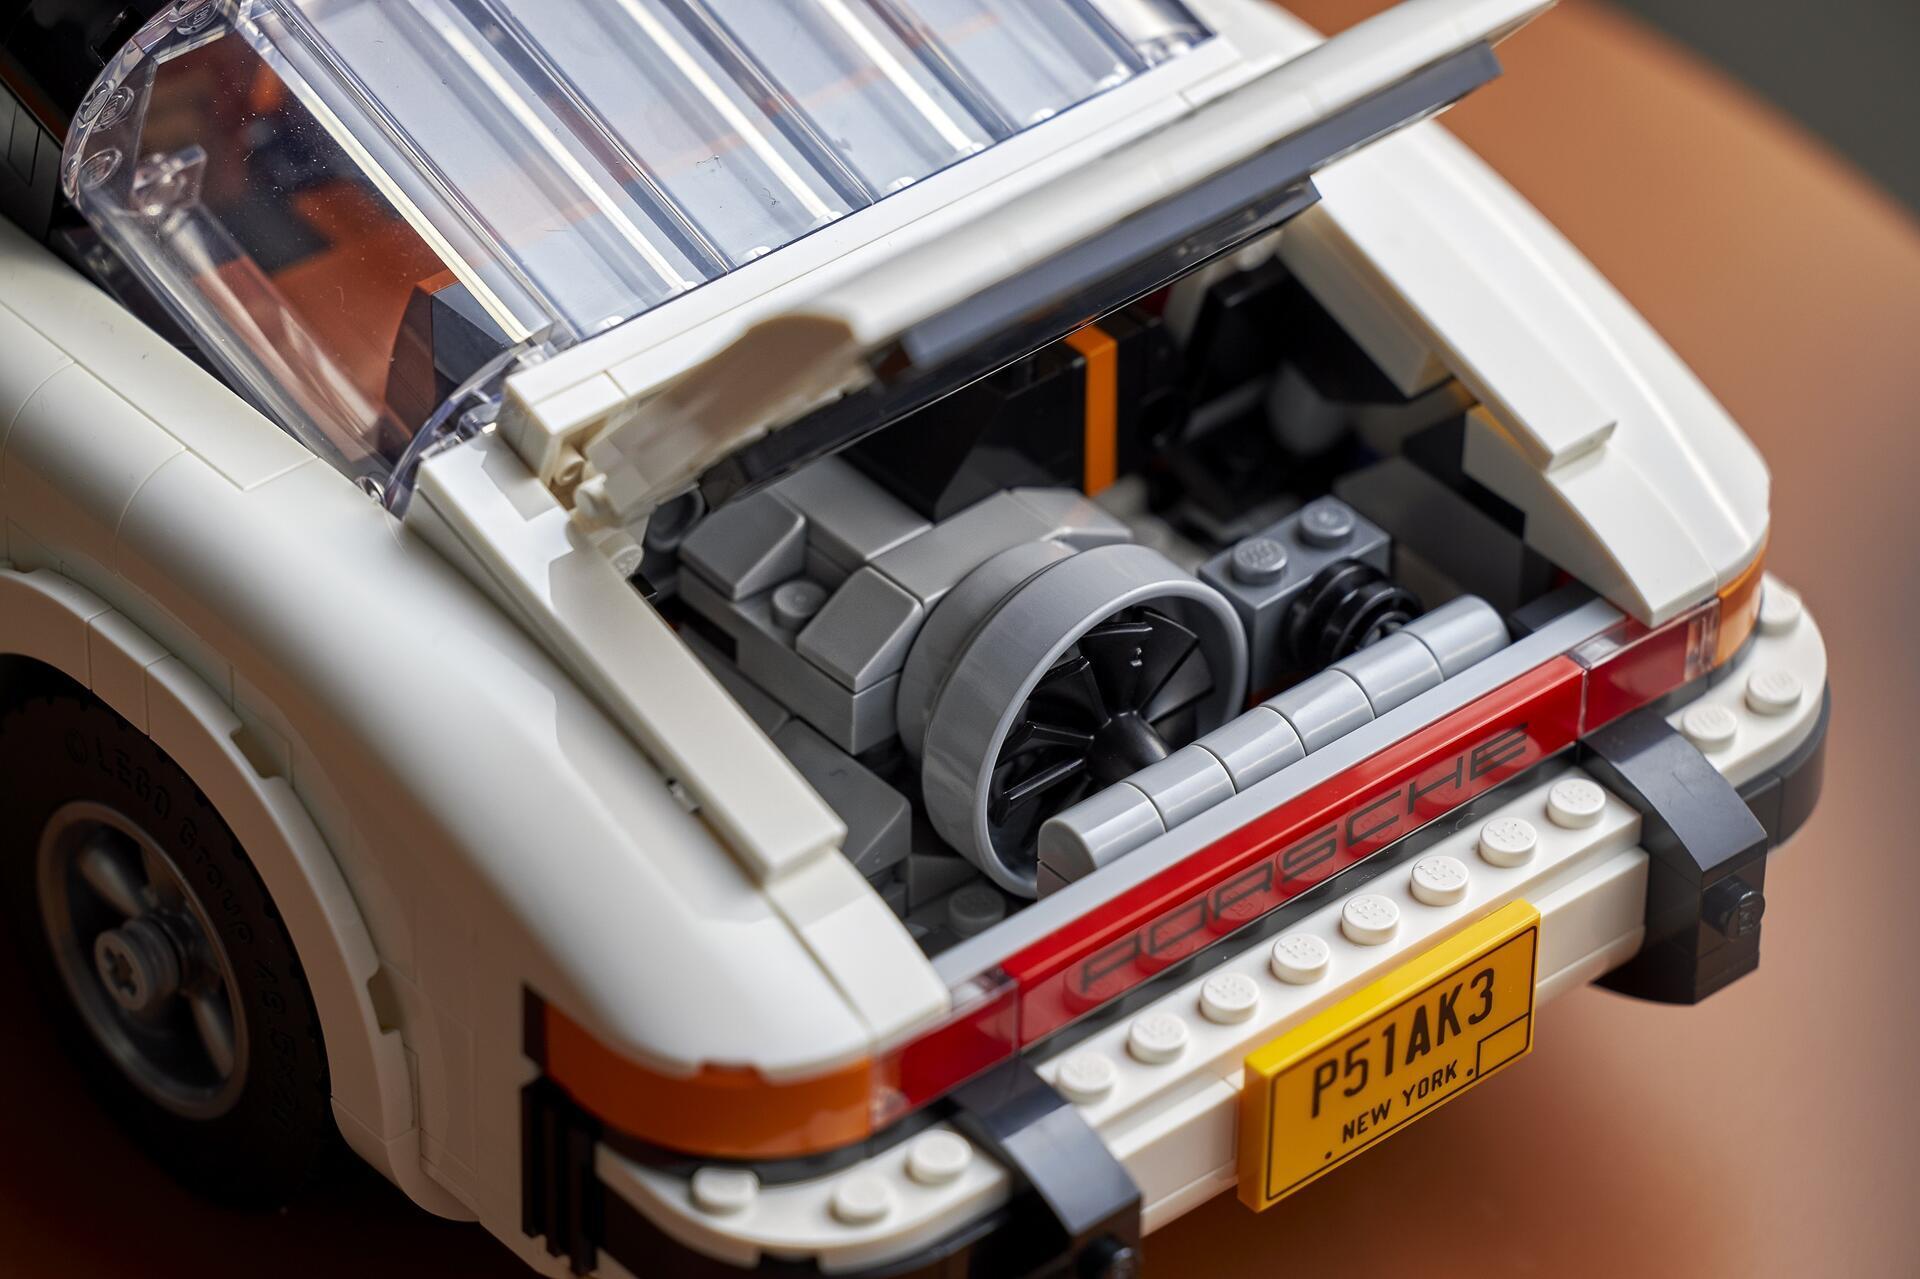 porsche-911-duoc-lam-tu-1-458-mieng-lego